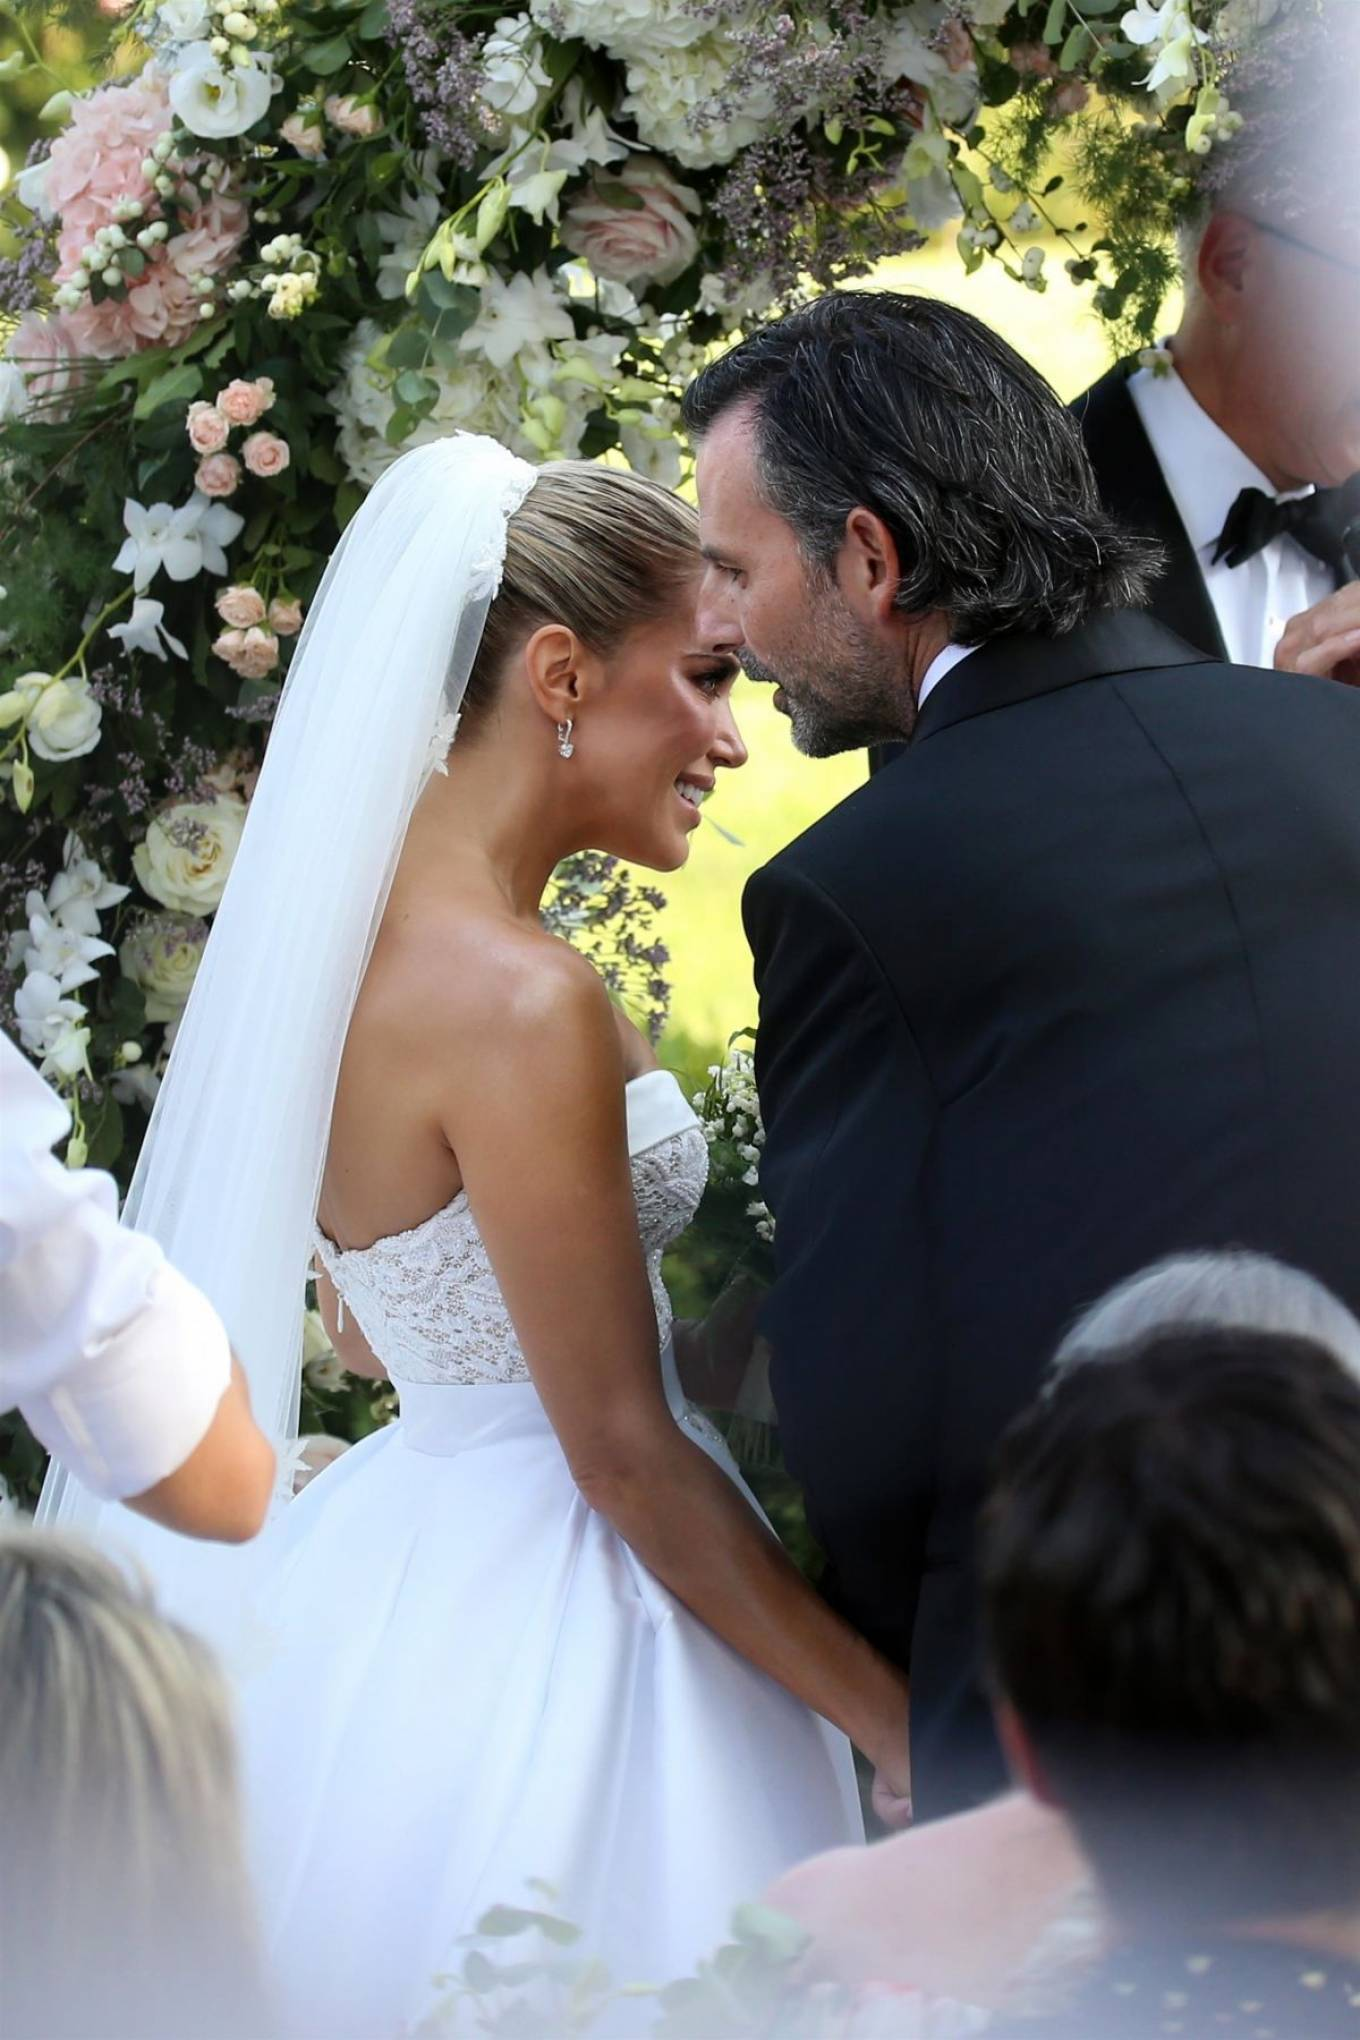 Sylvie Meis 2020 : Sylvie Meis – Wedding Ceremony in Florence-01